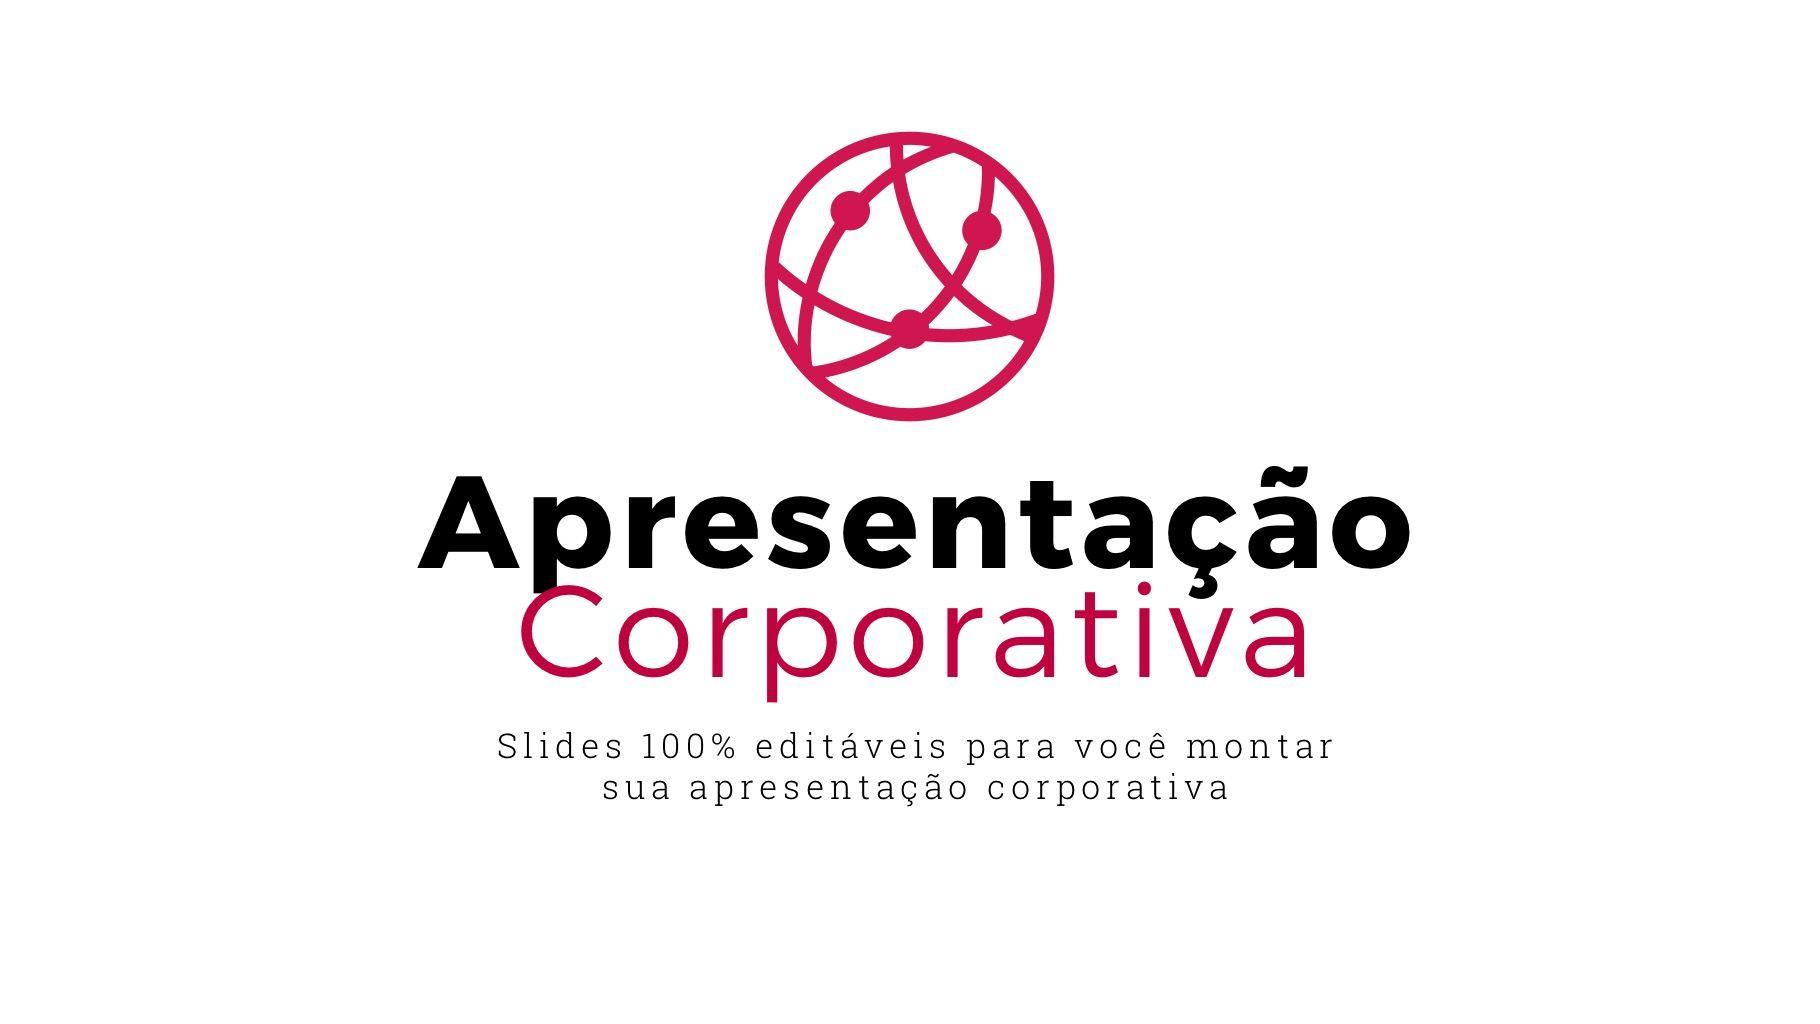 Apresentacao Corporativa Apresentacao Corporativo E